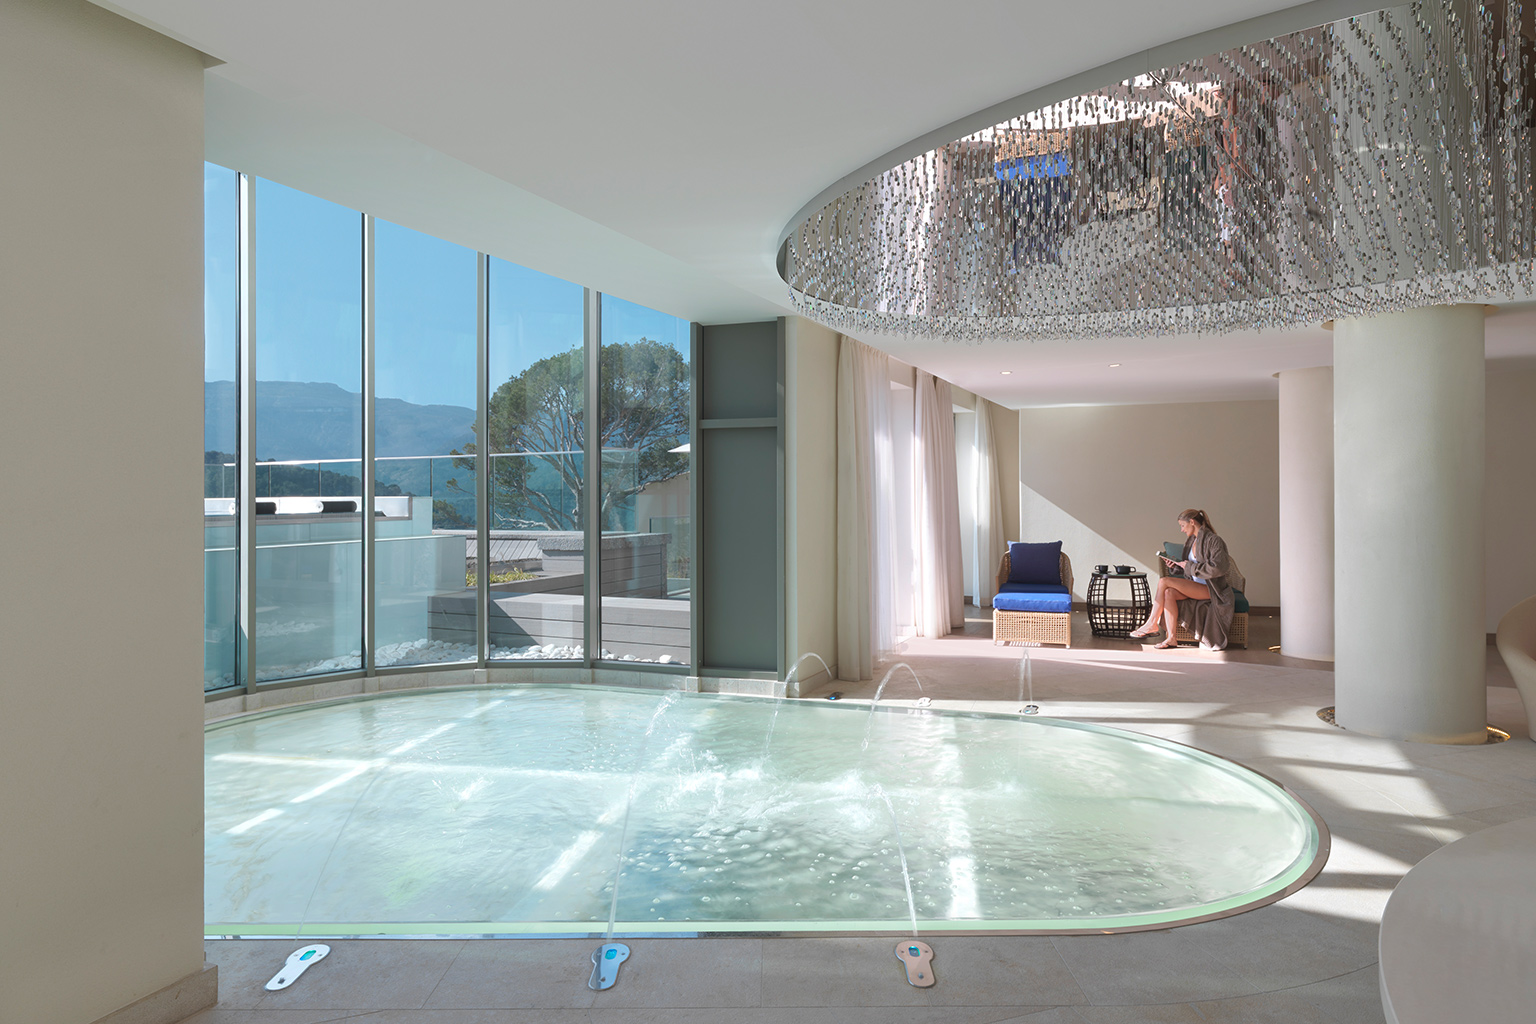 Jumeirah port soller hotel spa designreisen - Jumeirah port soller hotel spa ...